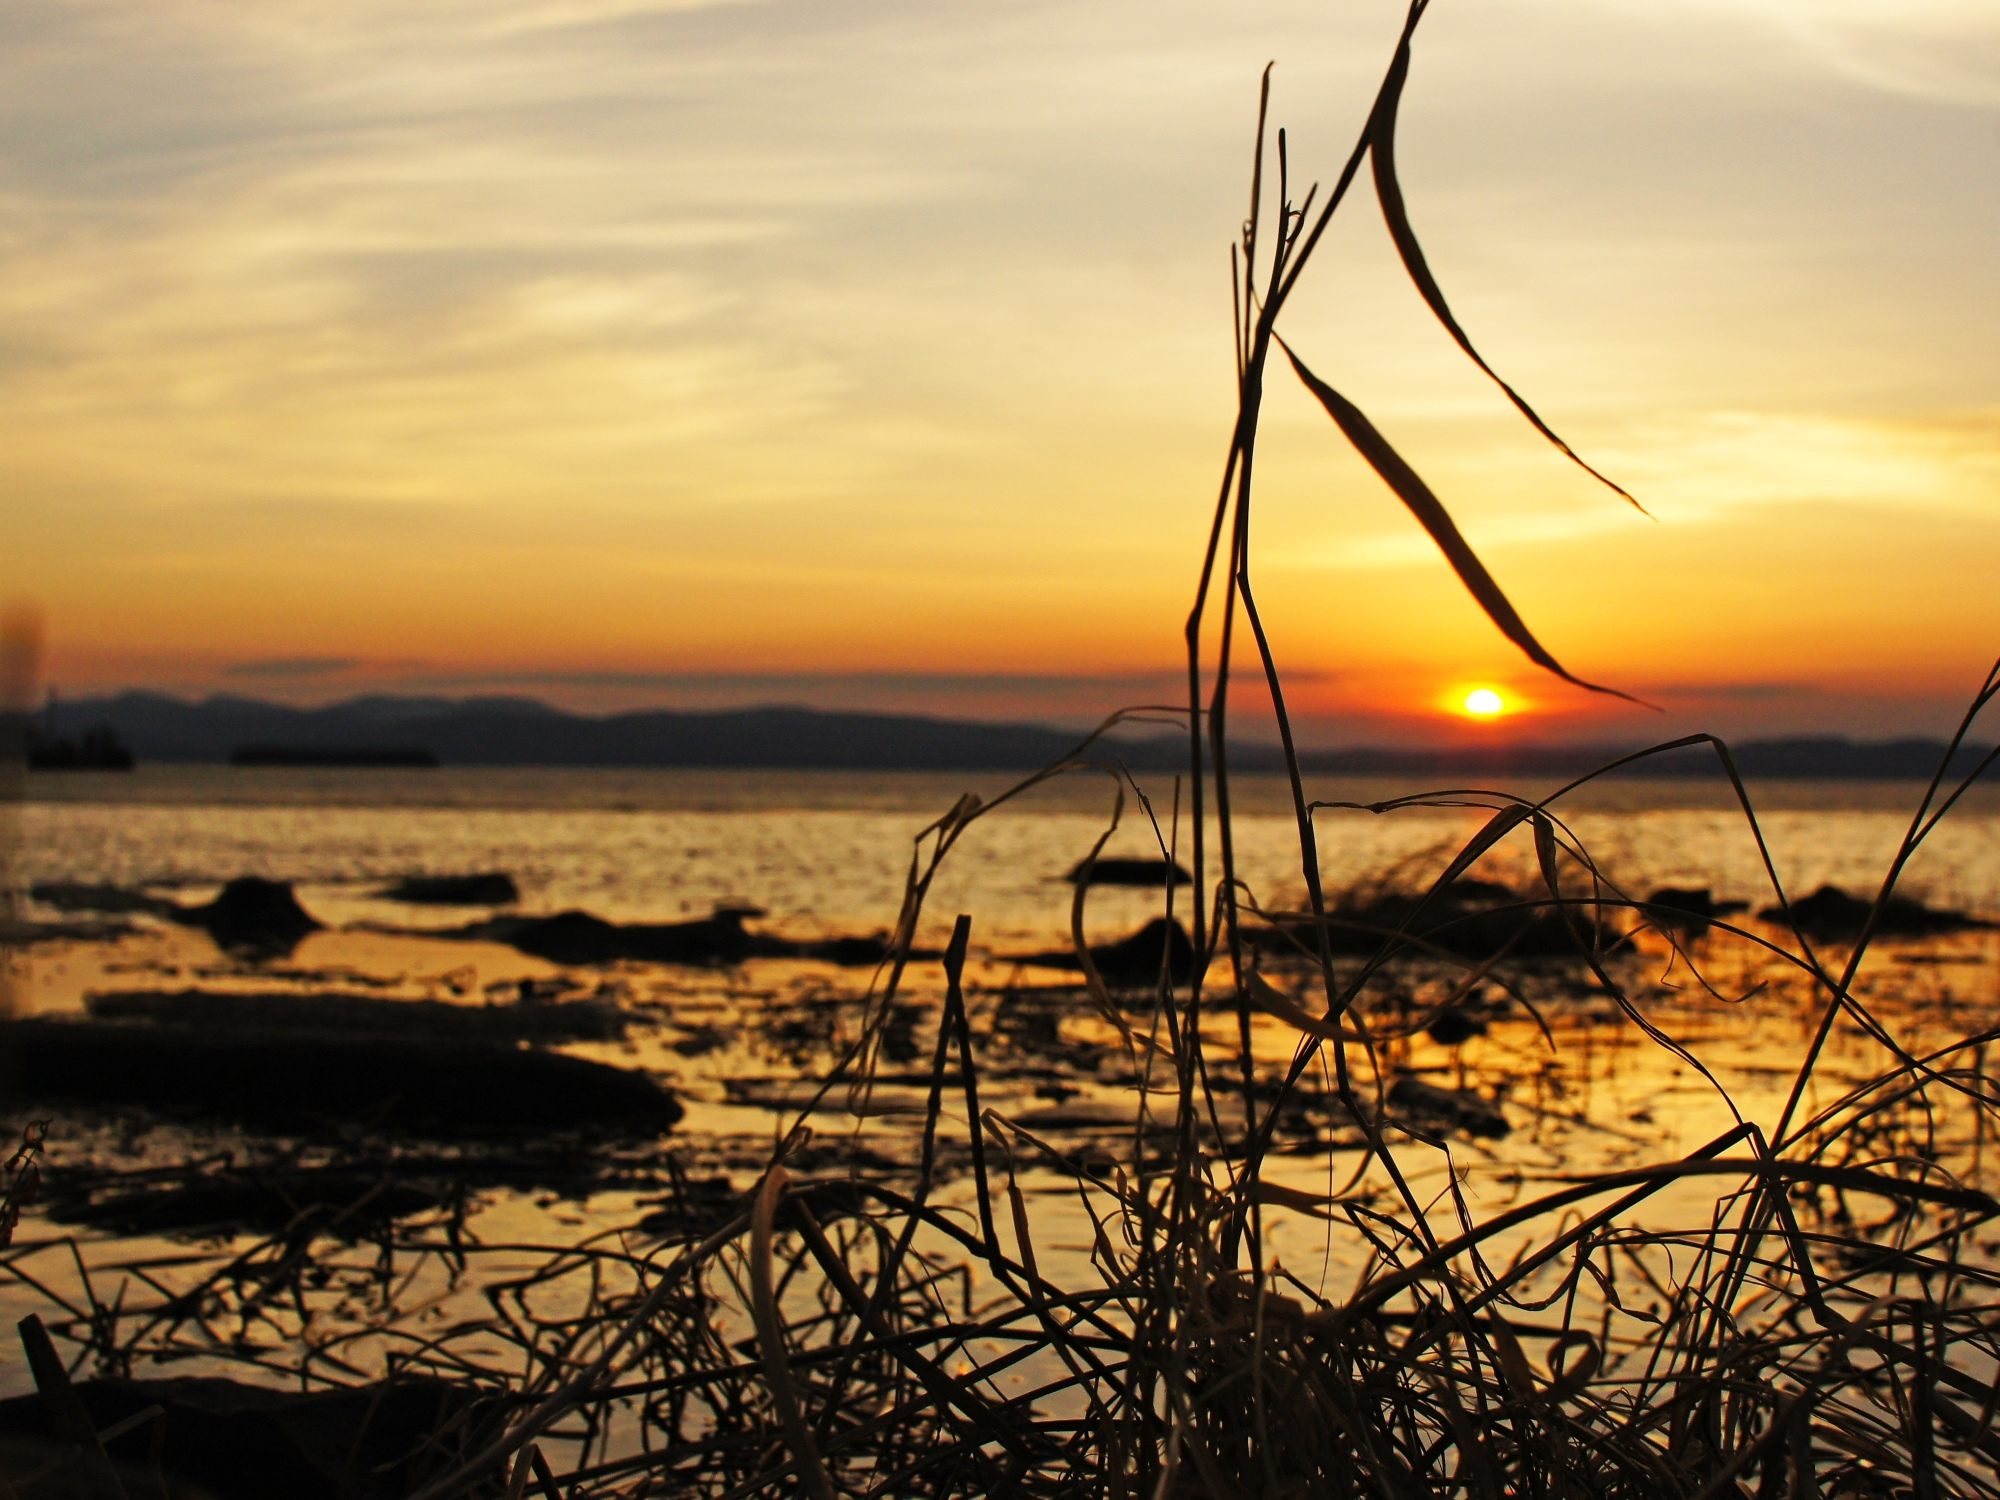 sunset over lake champlain, vermont